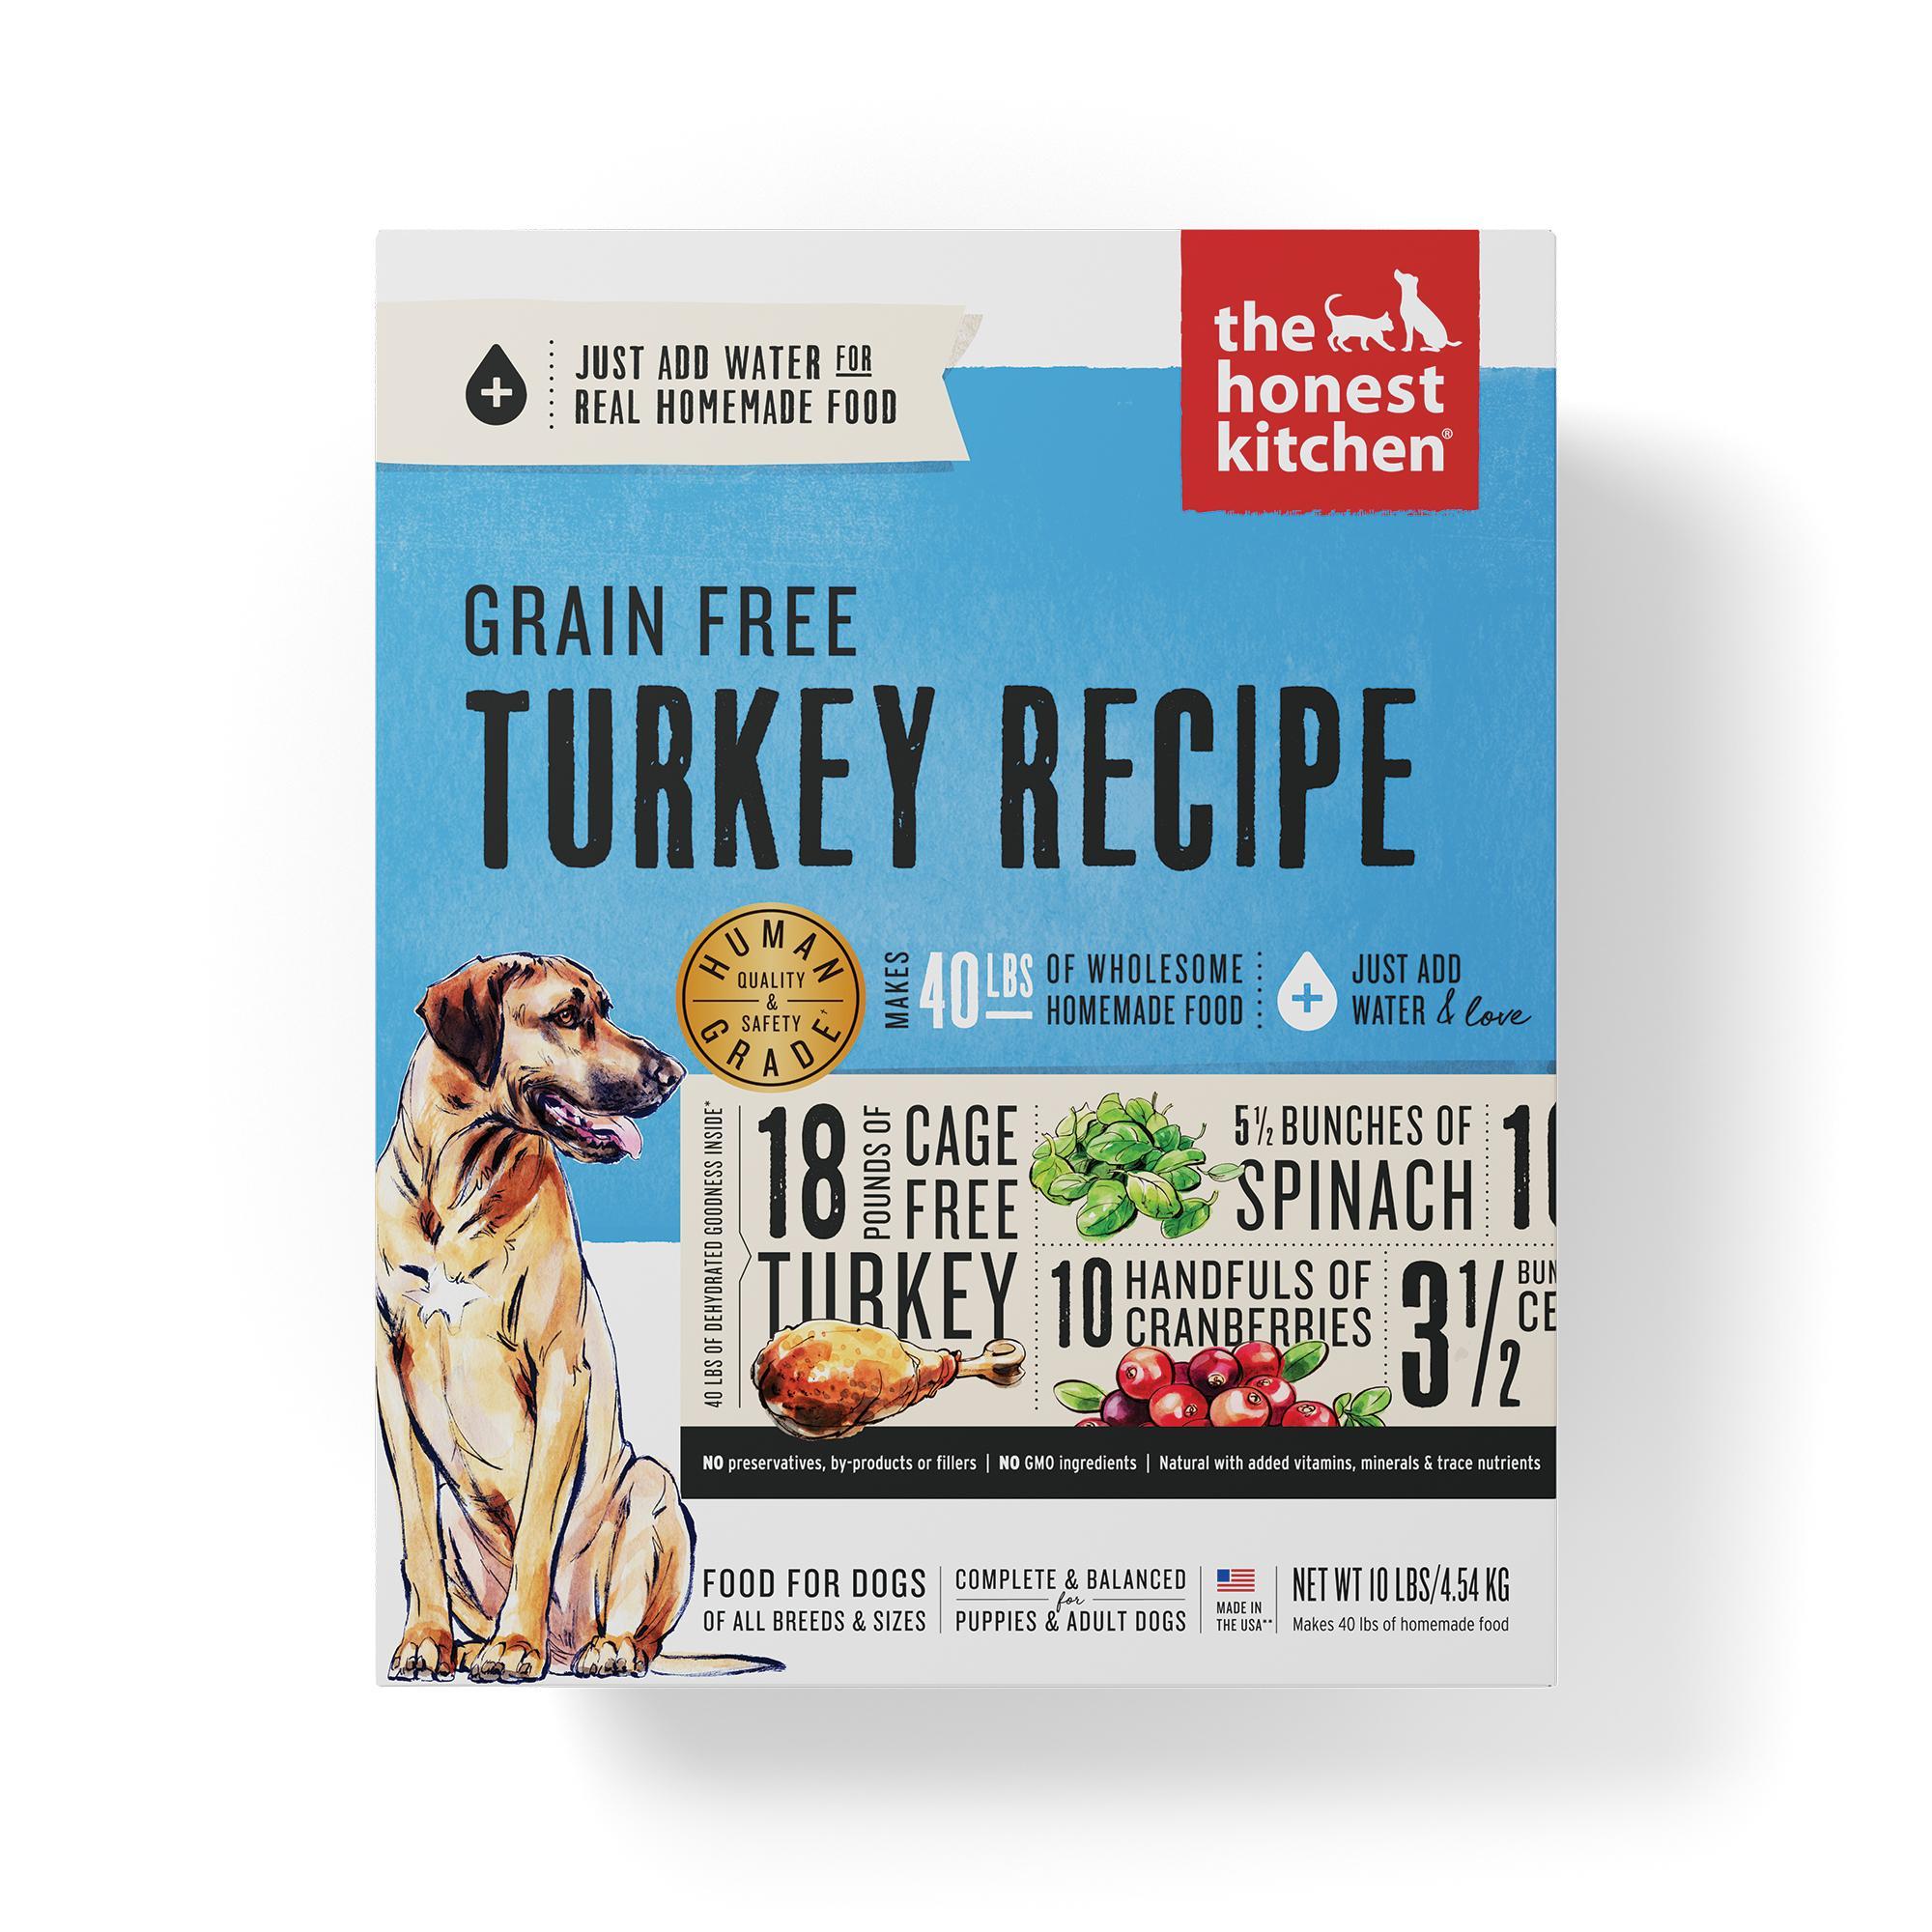 The Honest Kitchen Turkey Recipe Grain-Free Dehydrated Dog Food, 10-lb box